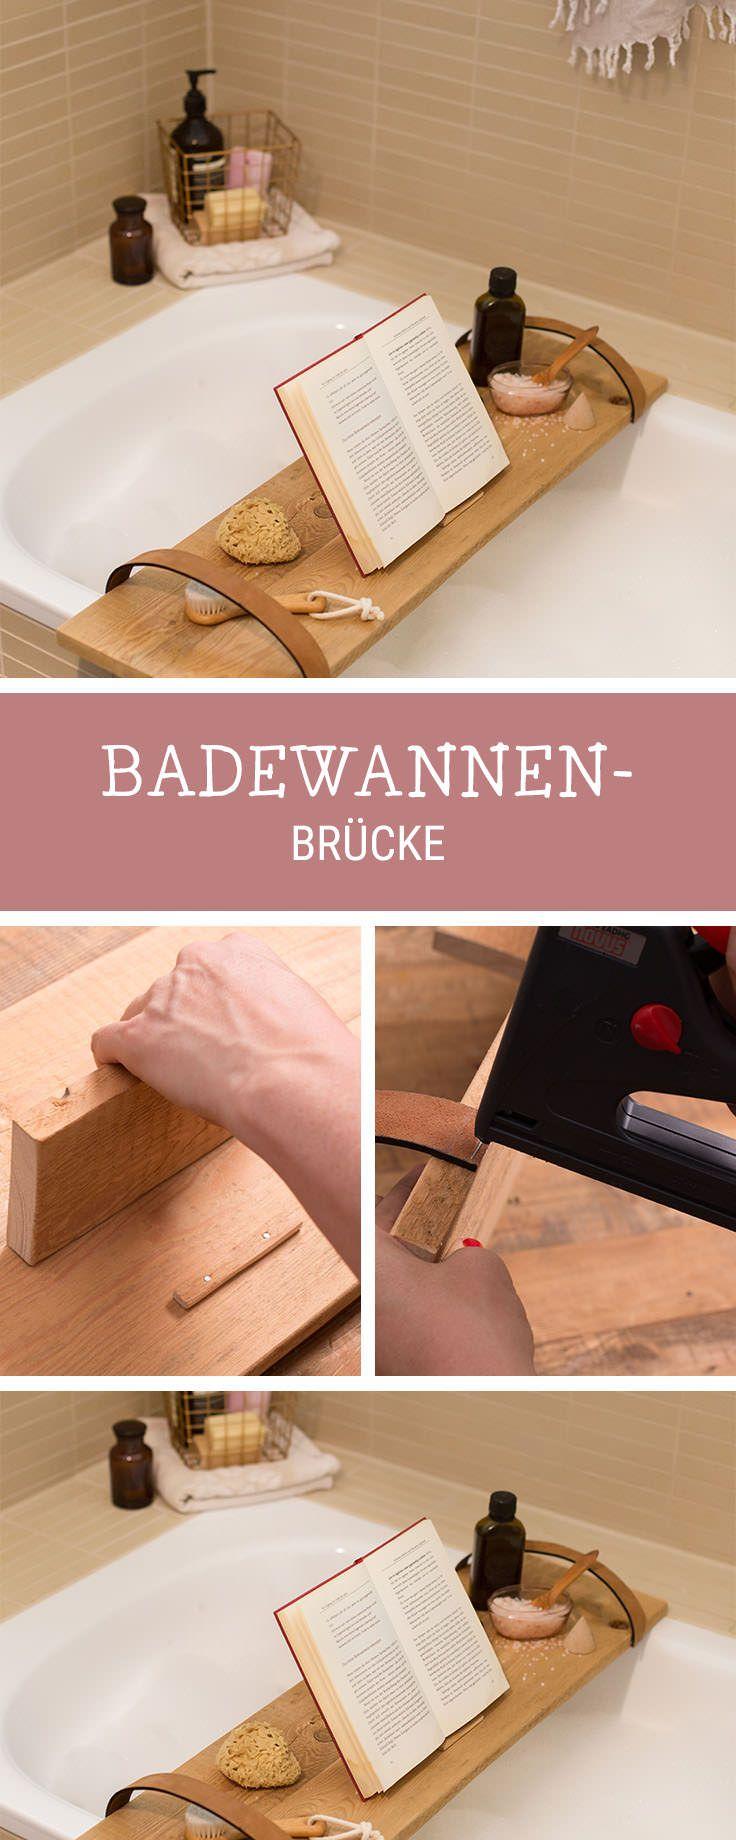 Entspannung beim Wellnessbad: Badewannentisch aus Holz bauen / bathroom inspiration: build a wooden bathtub table via DaWanda.com